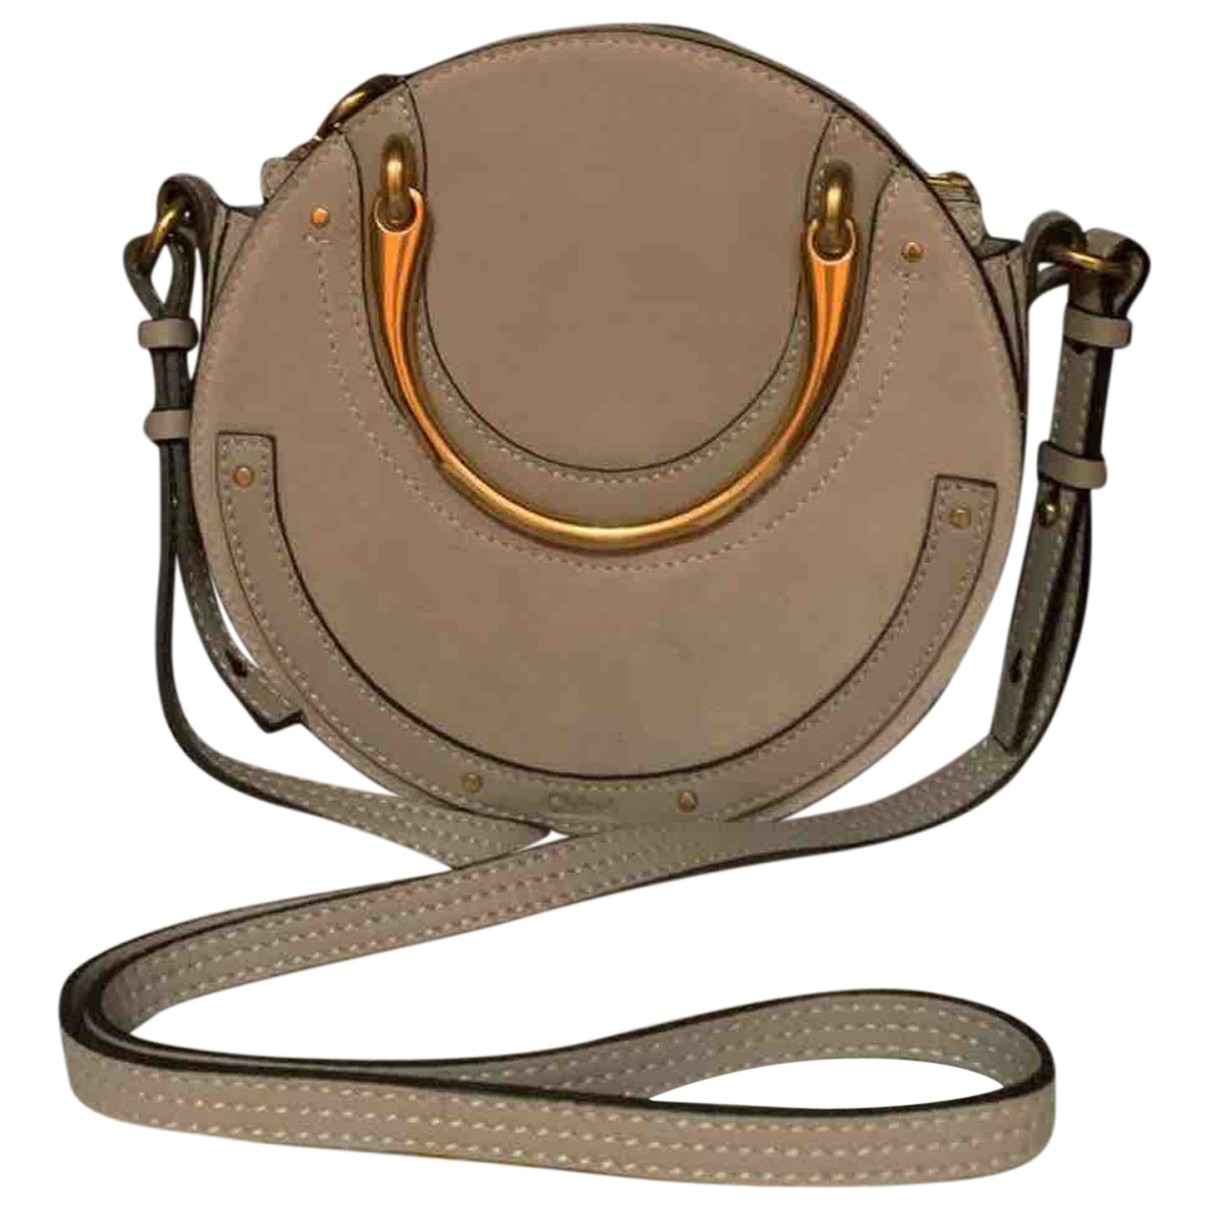 Chloé Pixie Beige Leather handbag for Women \N